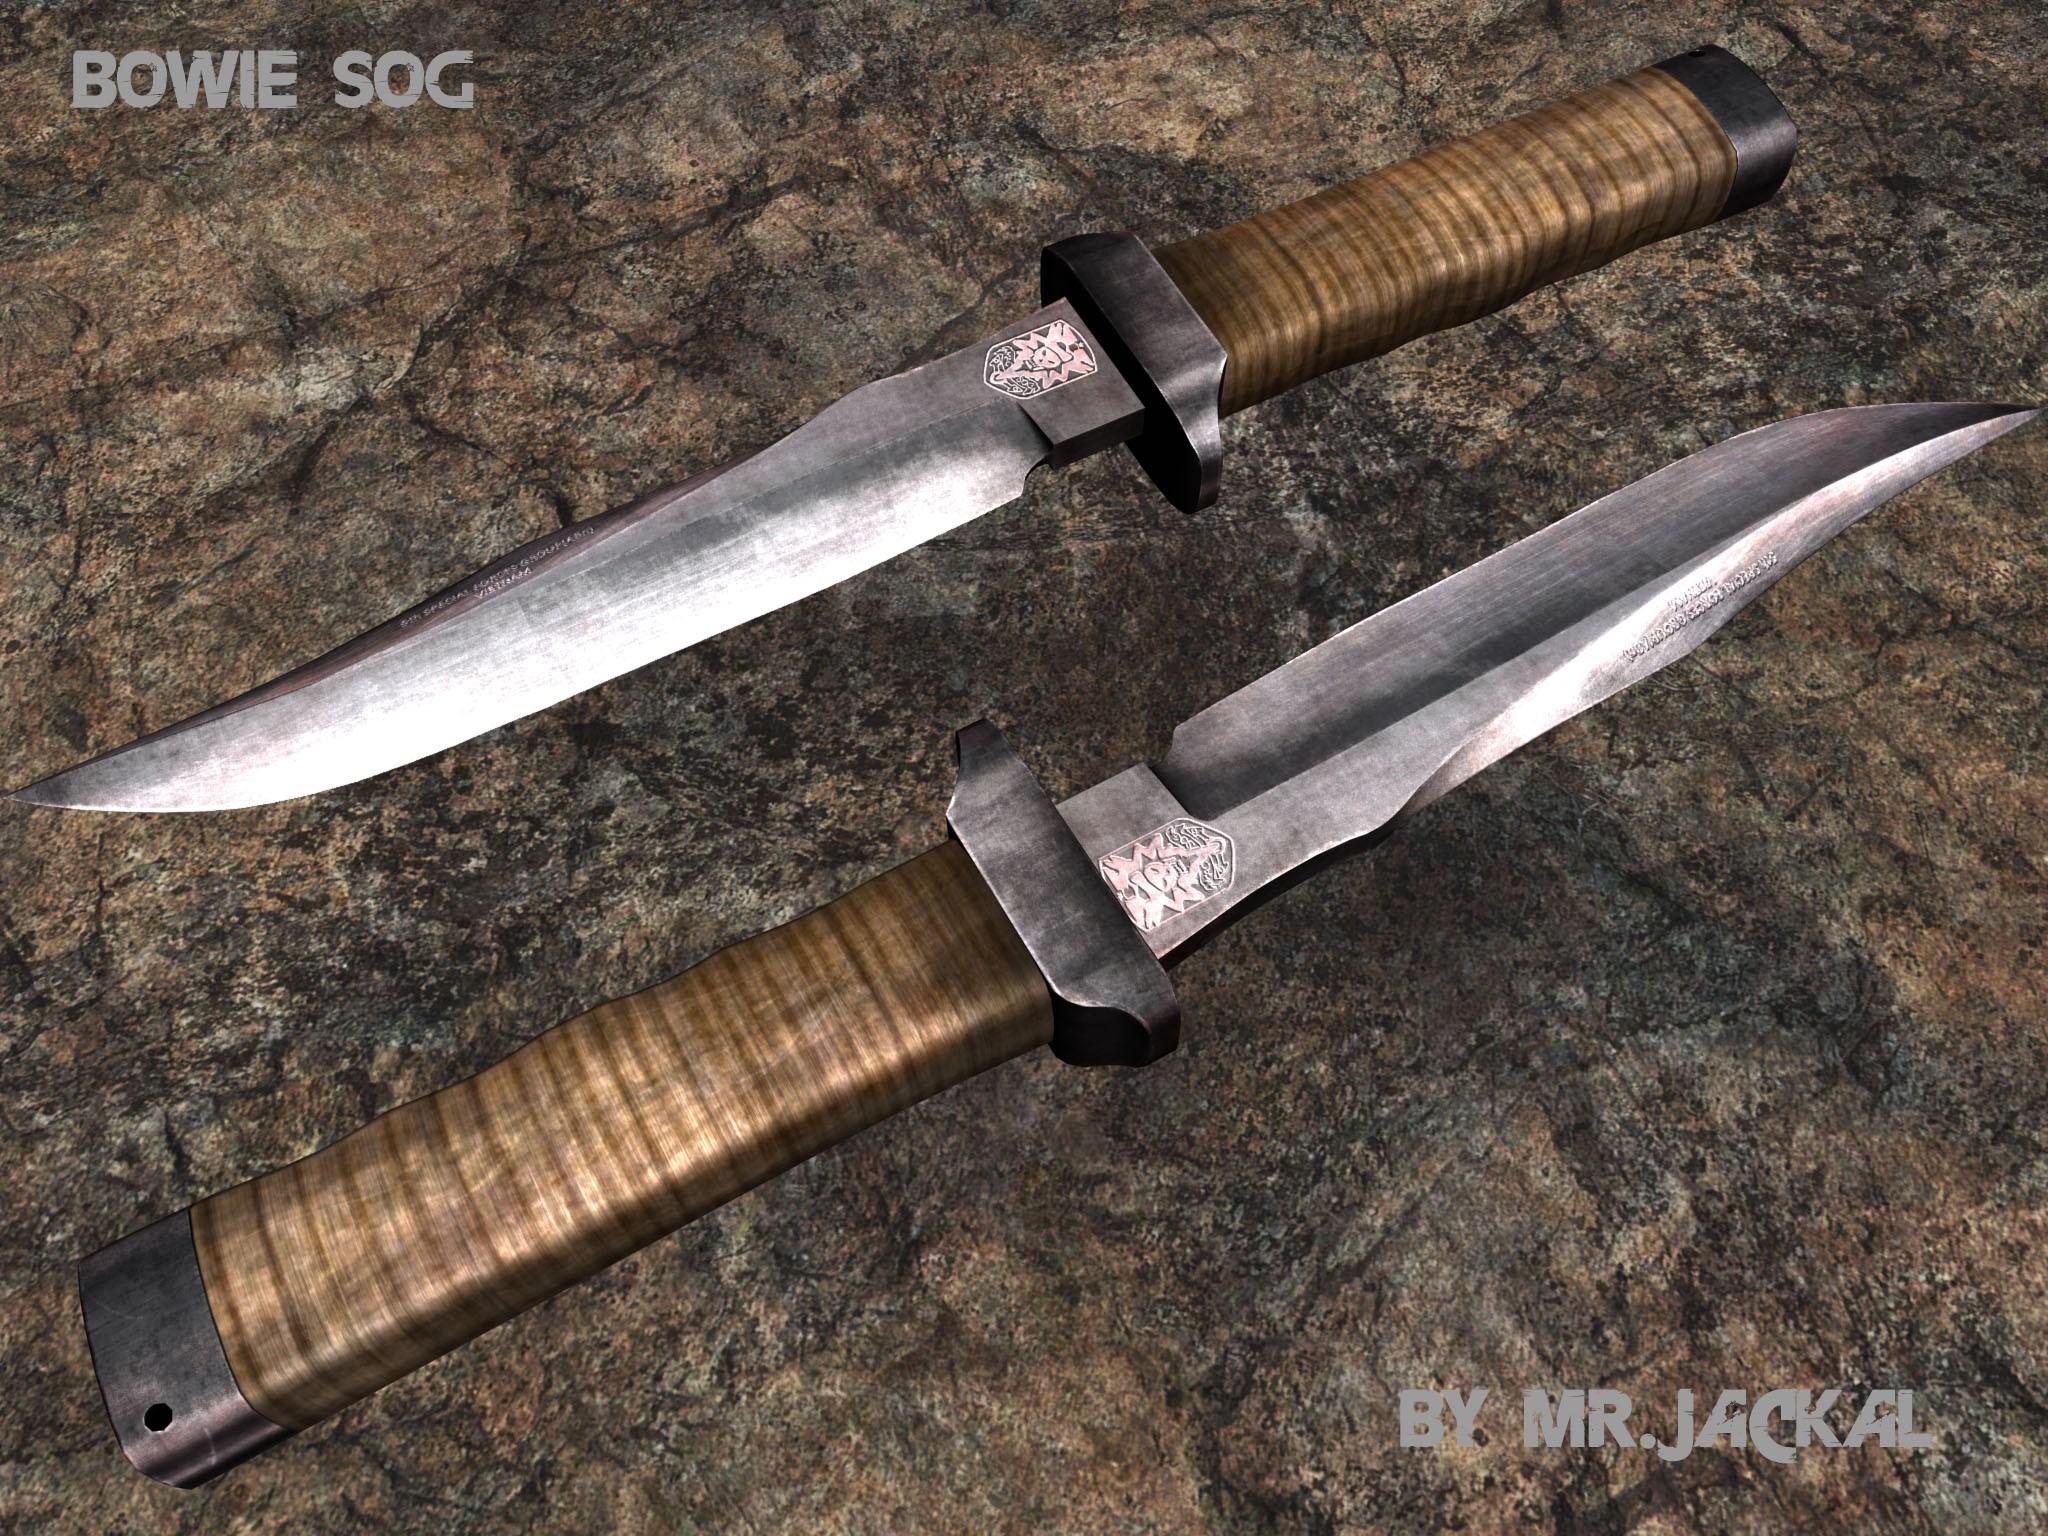 sog bowie knife models gt melee weapons gt knives gamebanana